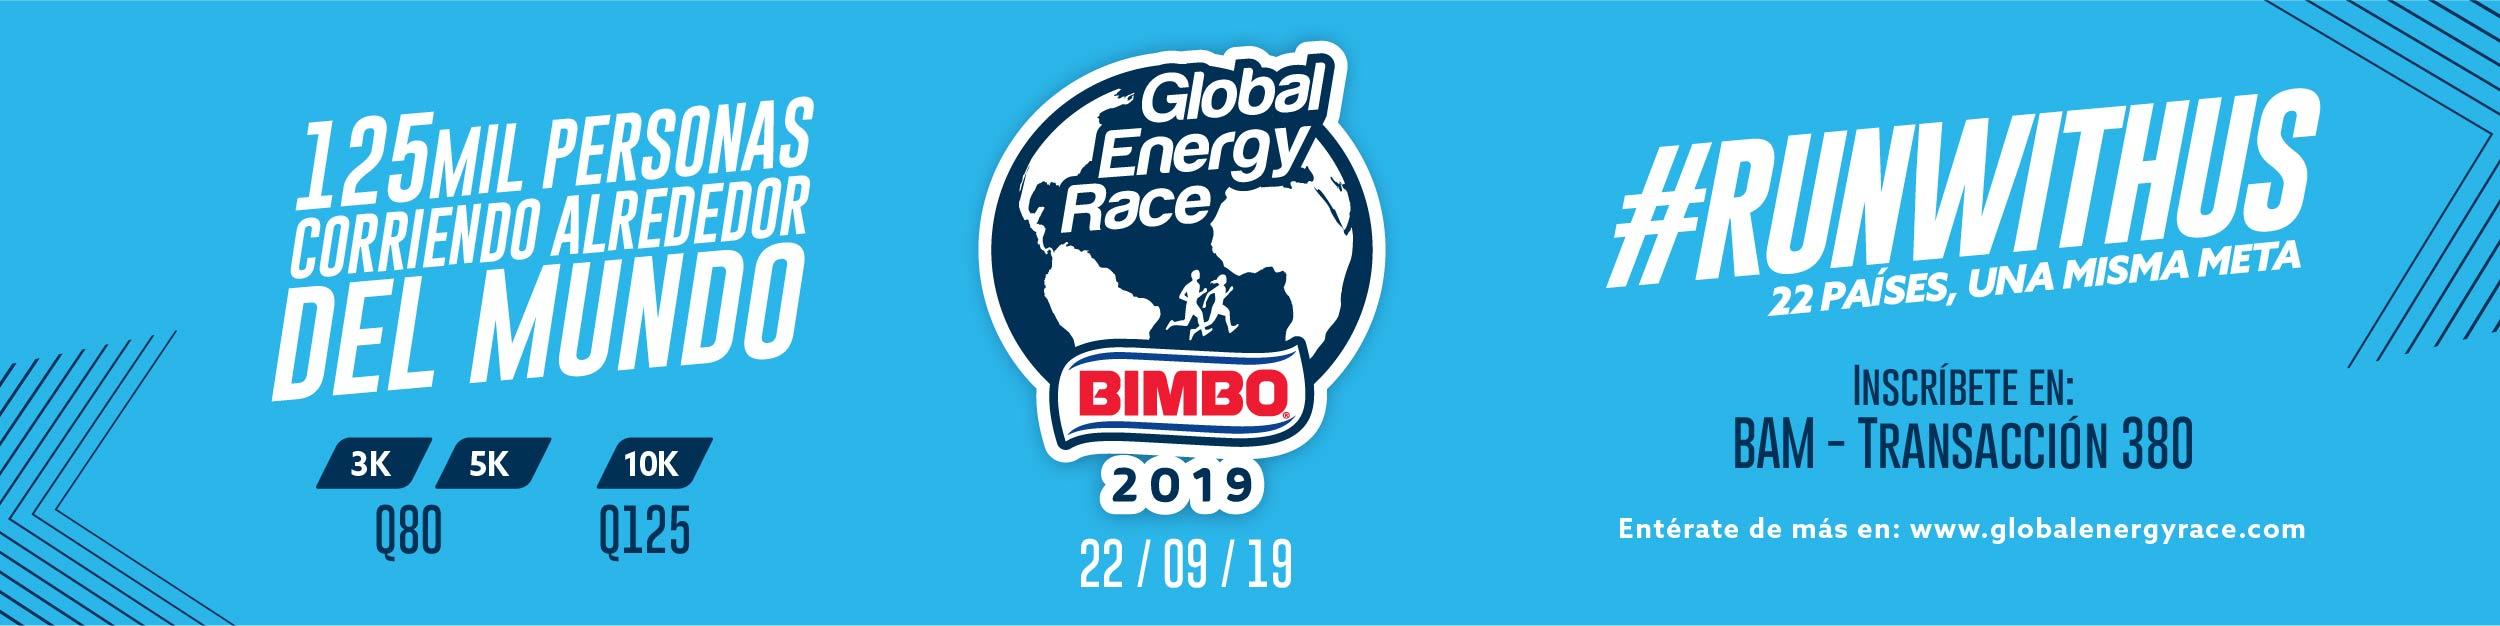 BIMBO GLOBAL RACE GUATEMALA